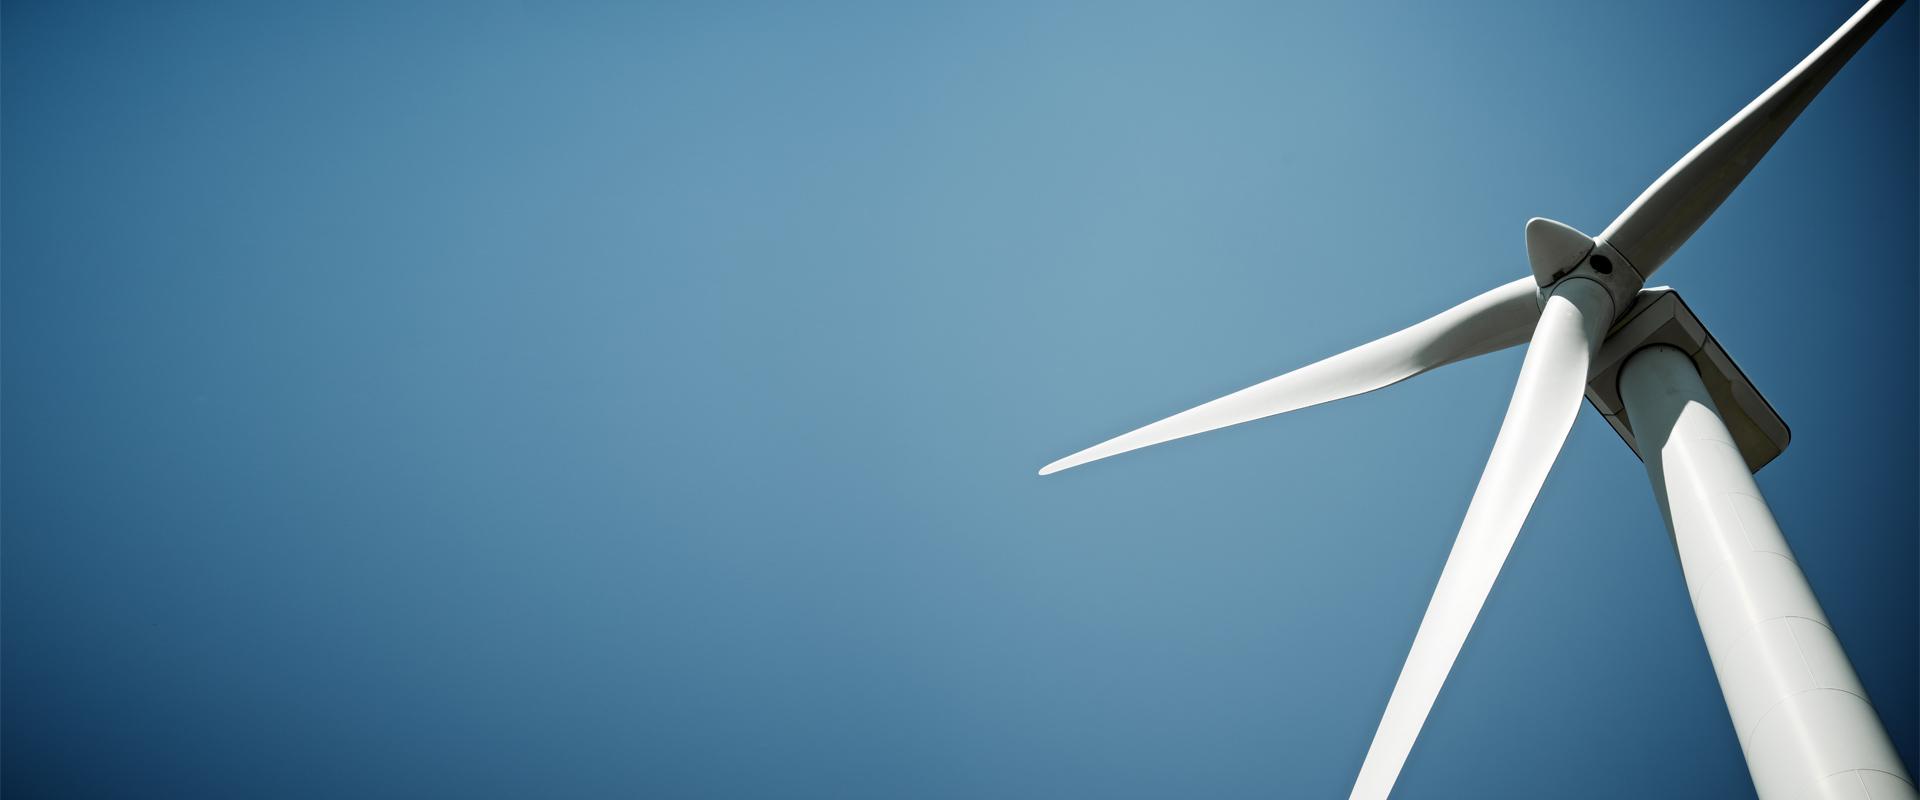 Sagawe und Klages Anwaltskanzlei Beratung Erneuerbare Energien Windkraftrad vor blauem Himmel